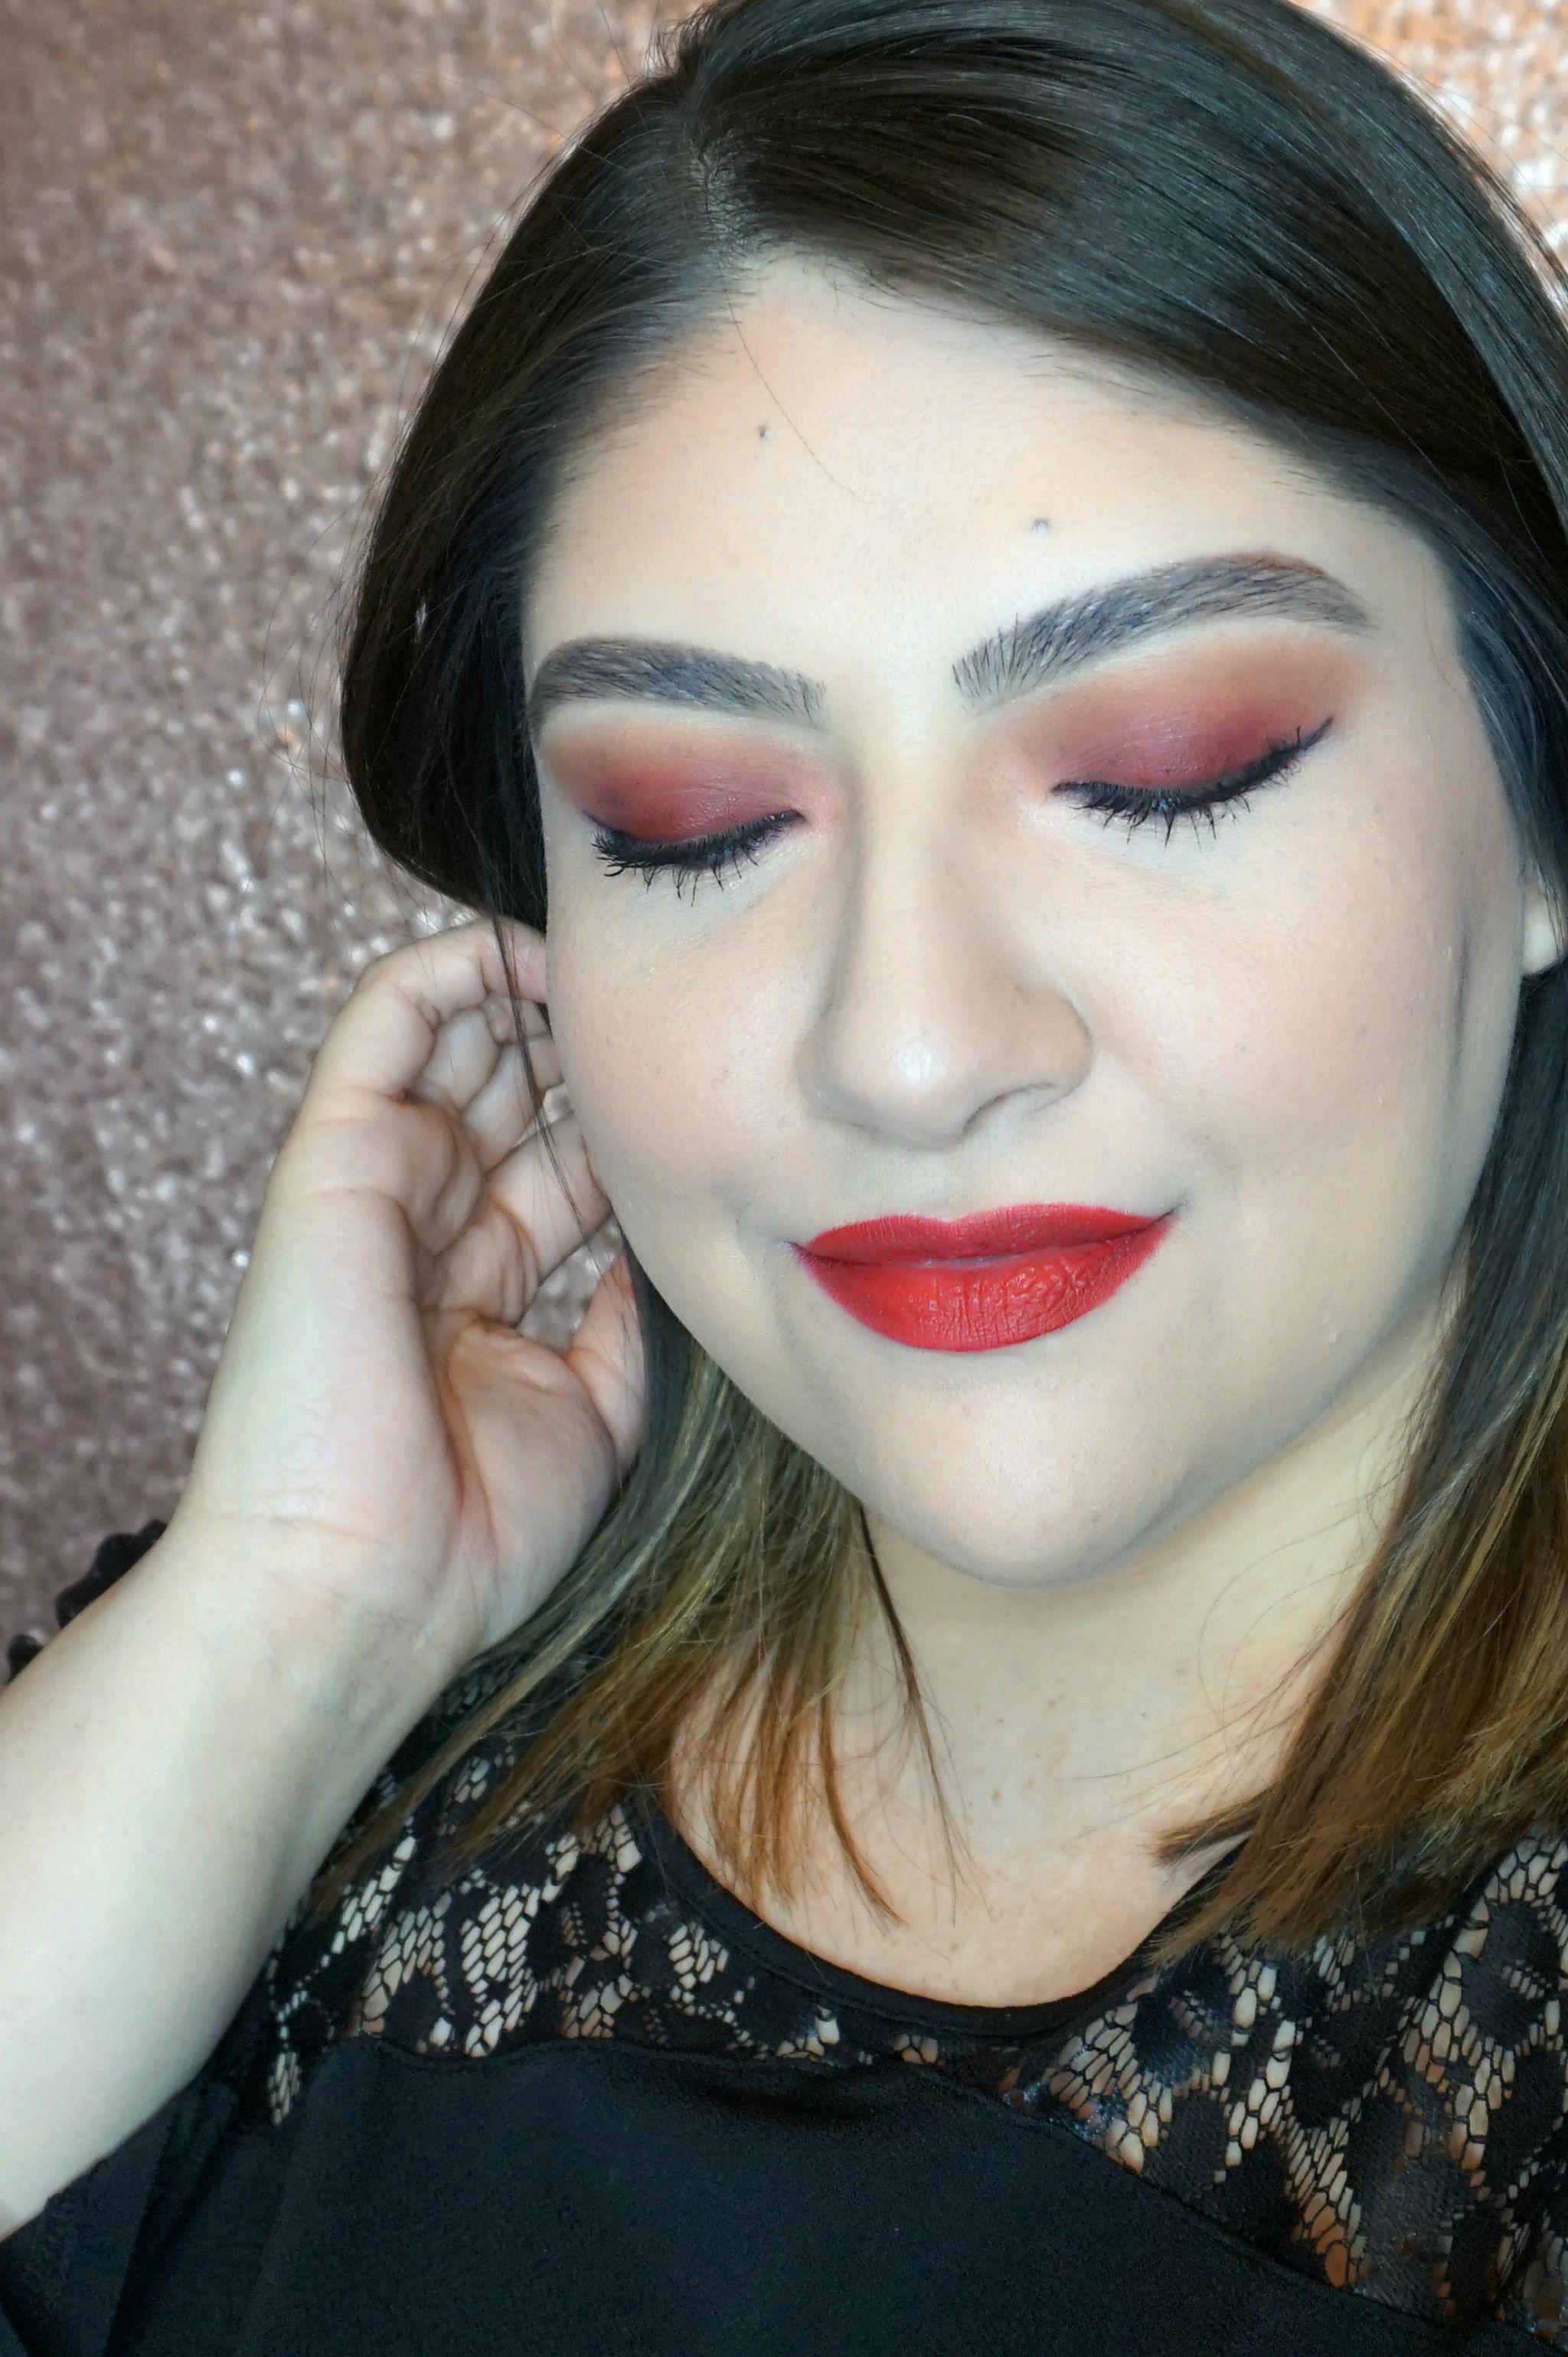 Easy Bold Date Night Makeup Look // Easy Makeup Look // Bold Makeup Look // Date Night Makeup | Beauty With Lily #beautyblogger #makeuplook #easymakeup #datenightmakeup